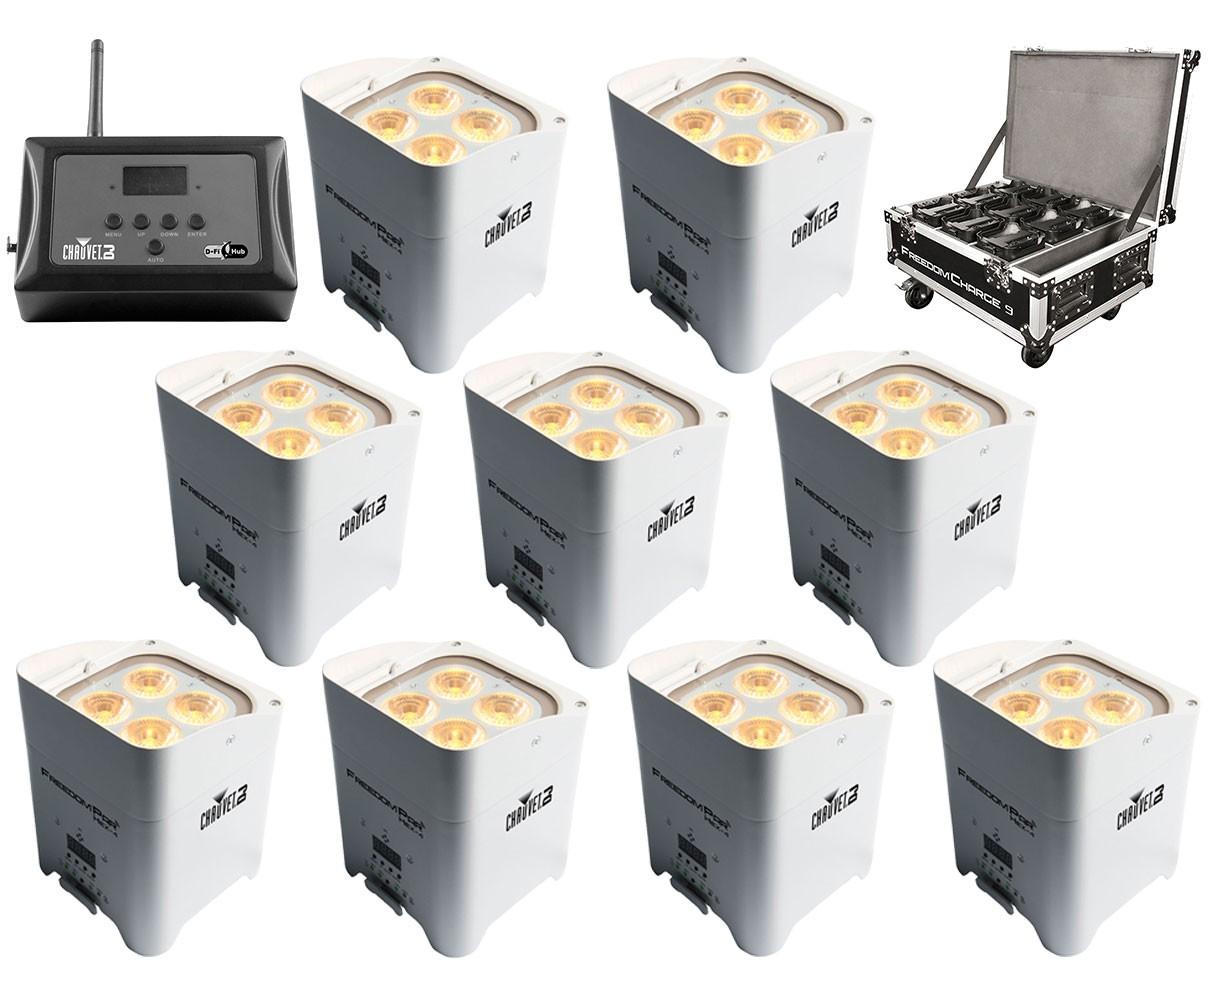 9x Chauvet Freedom Par Hex-4 White + Freedom Charge 9 + D-Fi Hub